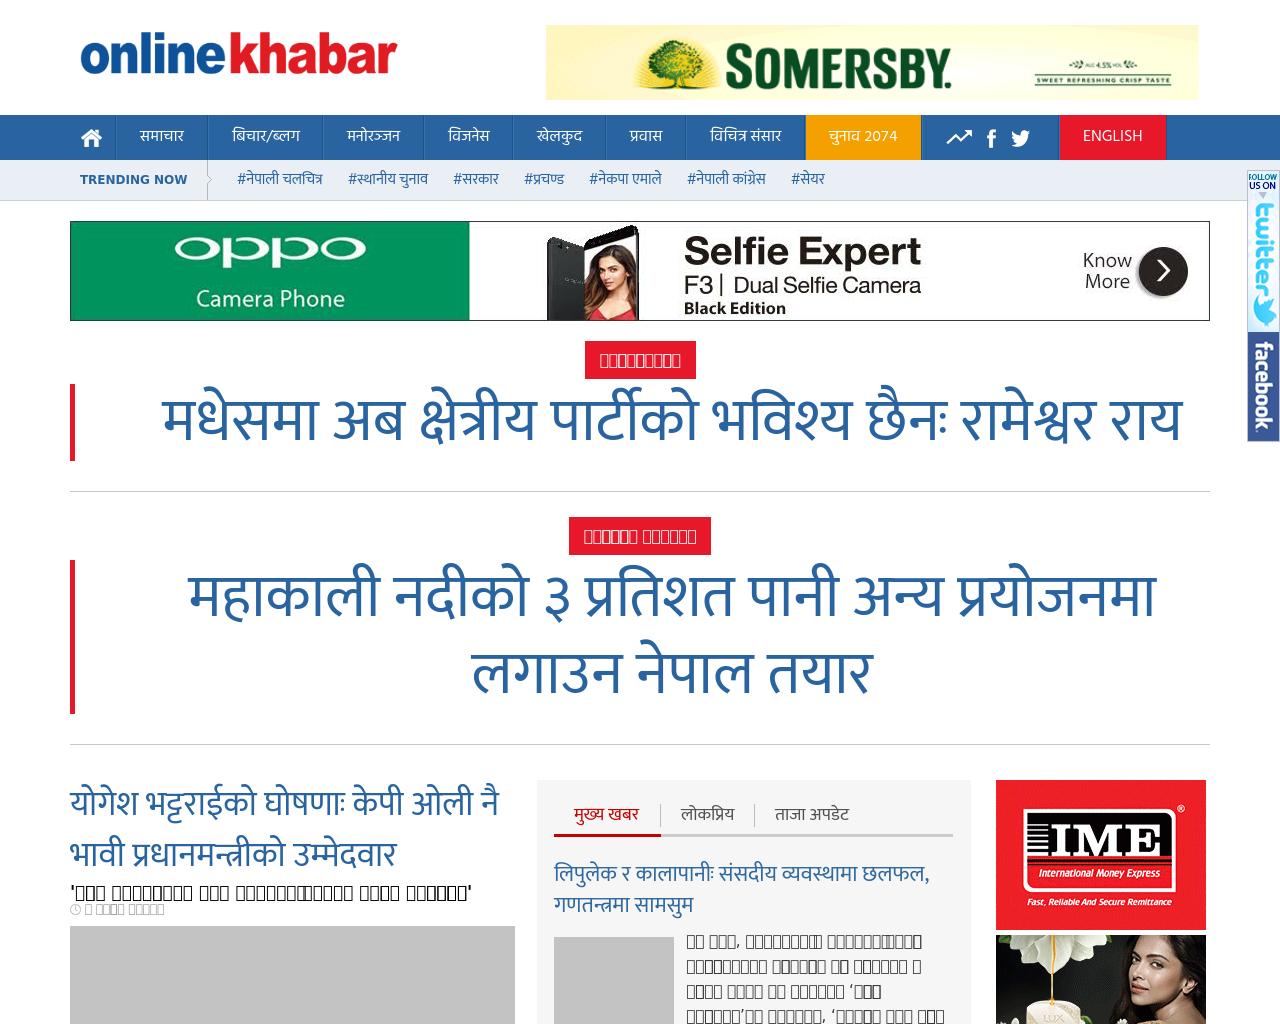 onlinekhabar-Advertising-Reviews-Pricing